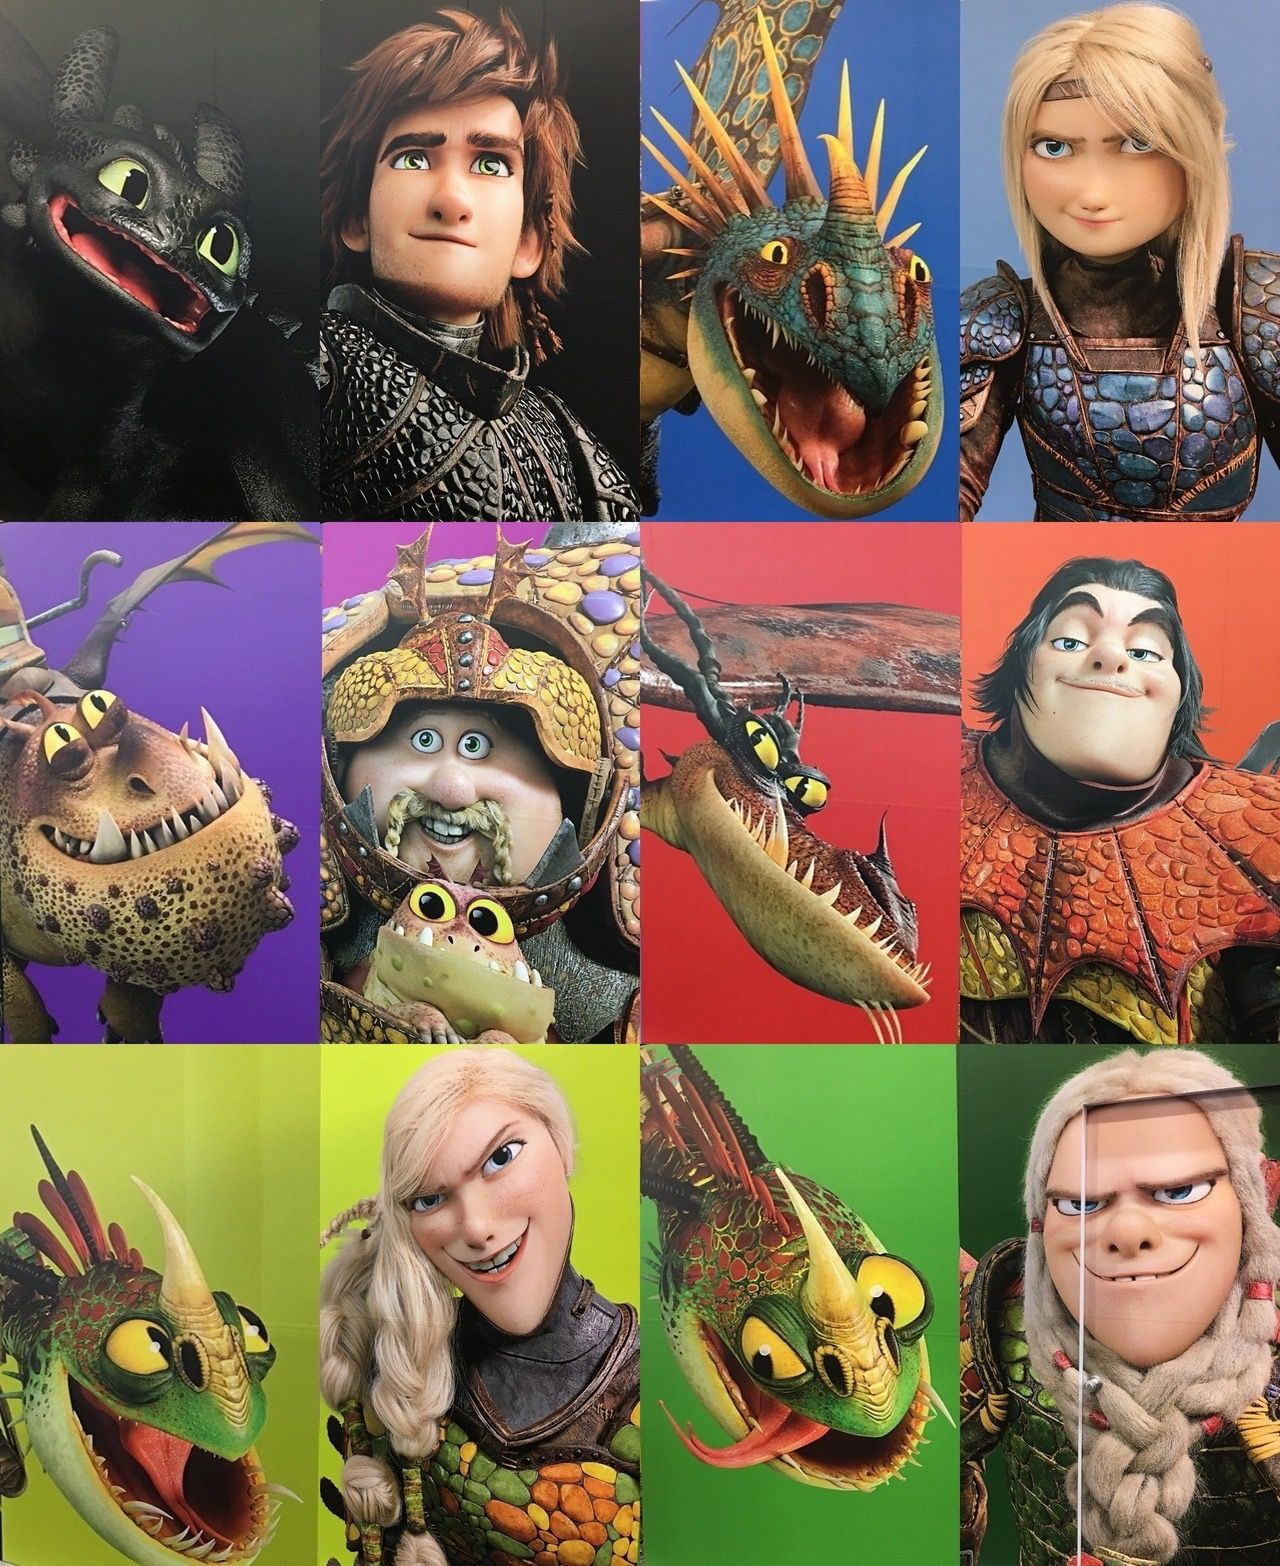 Httyd 3 Character Designs Yeeeee How Train Your Dragon How To Train Dragon How To Train Your Dragon